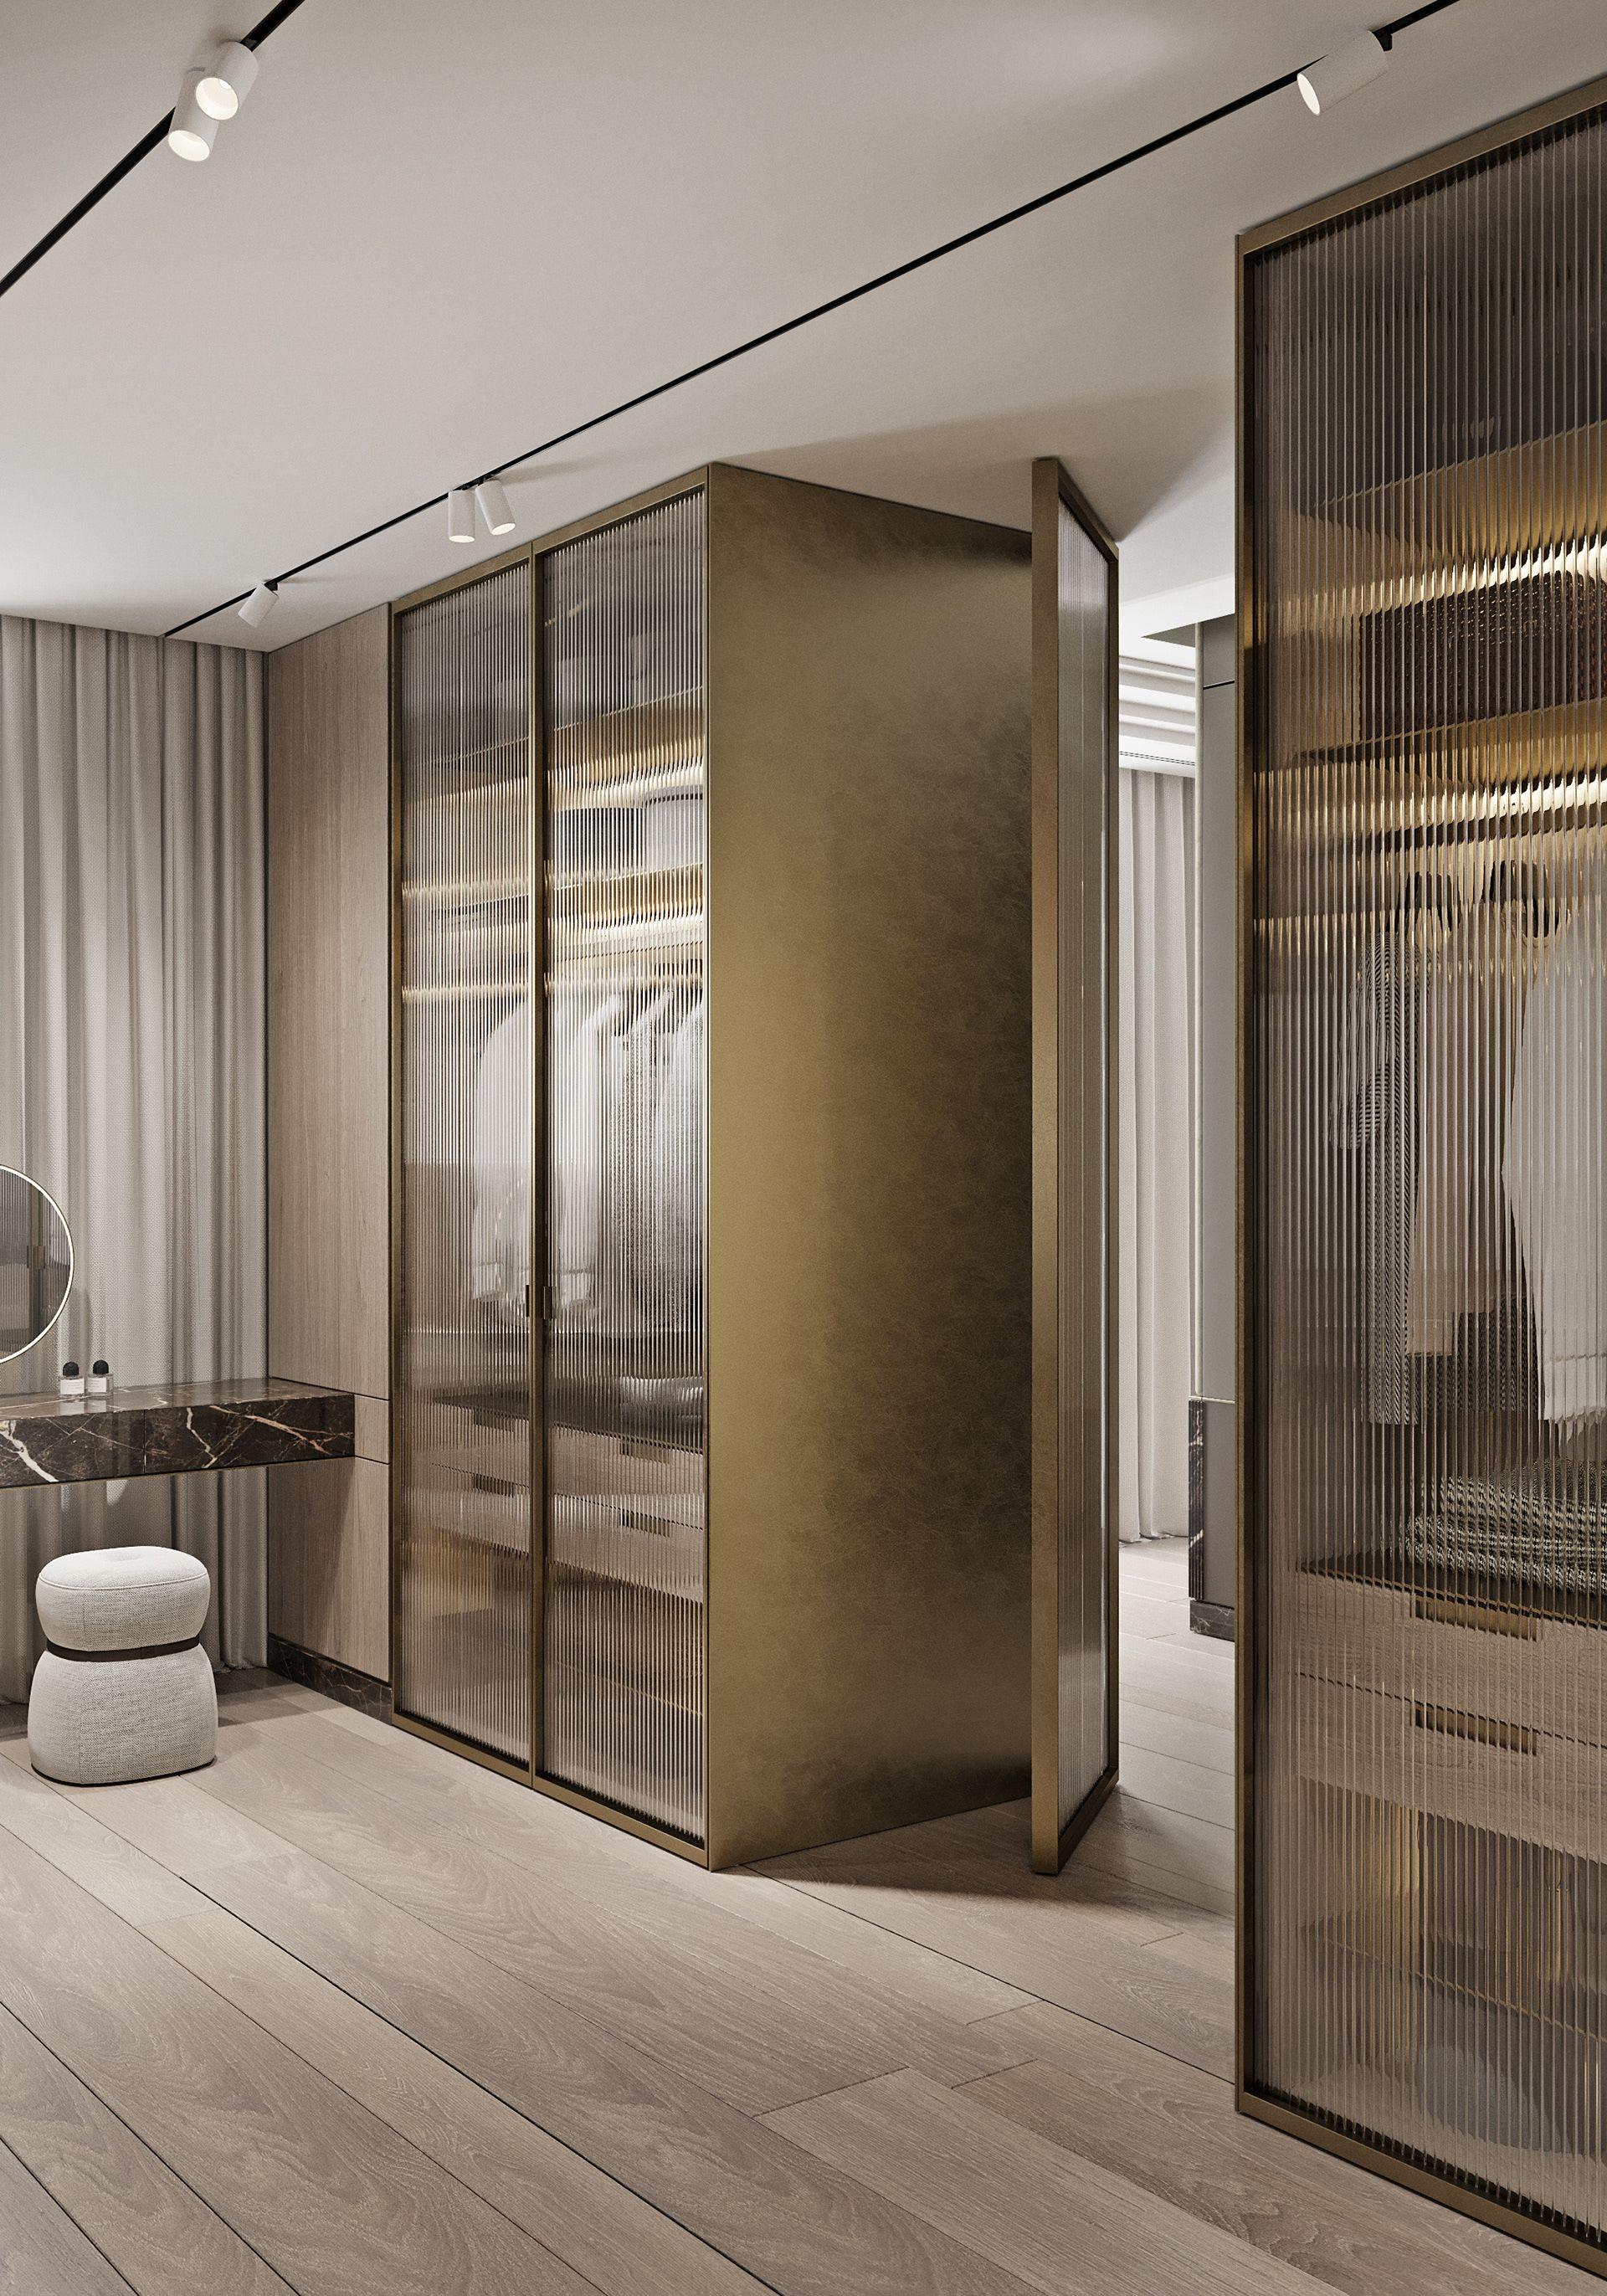 Tol Ko Oats Flat Part 2 On Behance Modern Bedroom Design